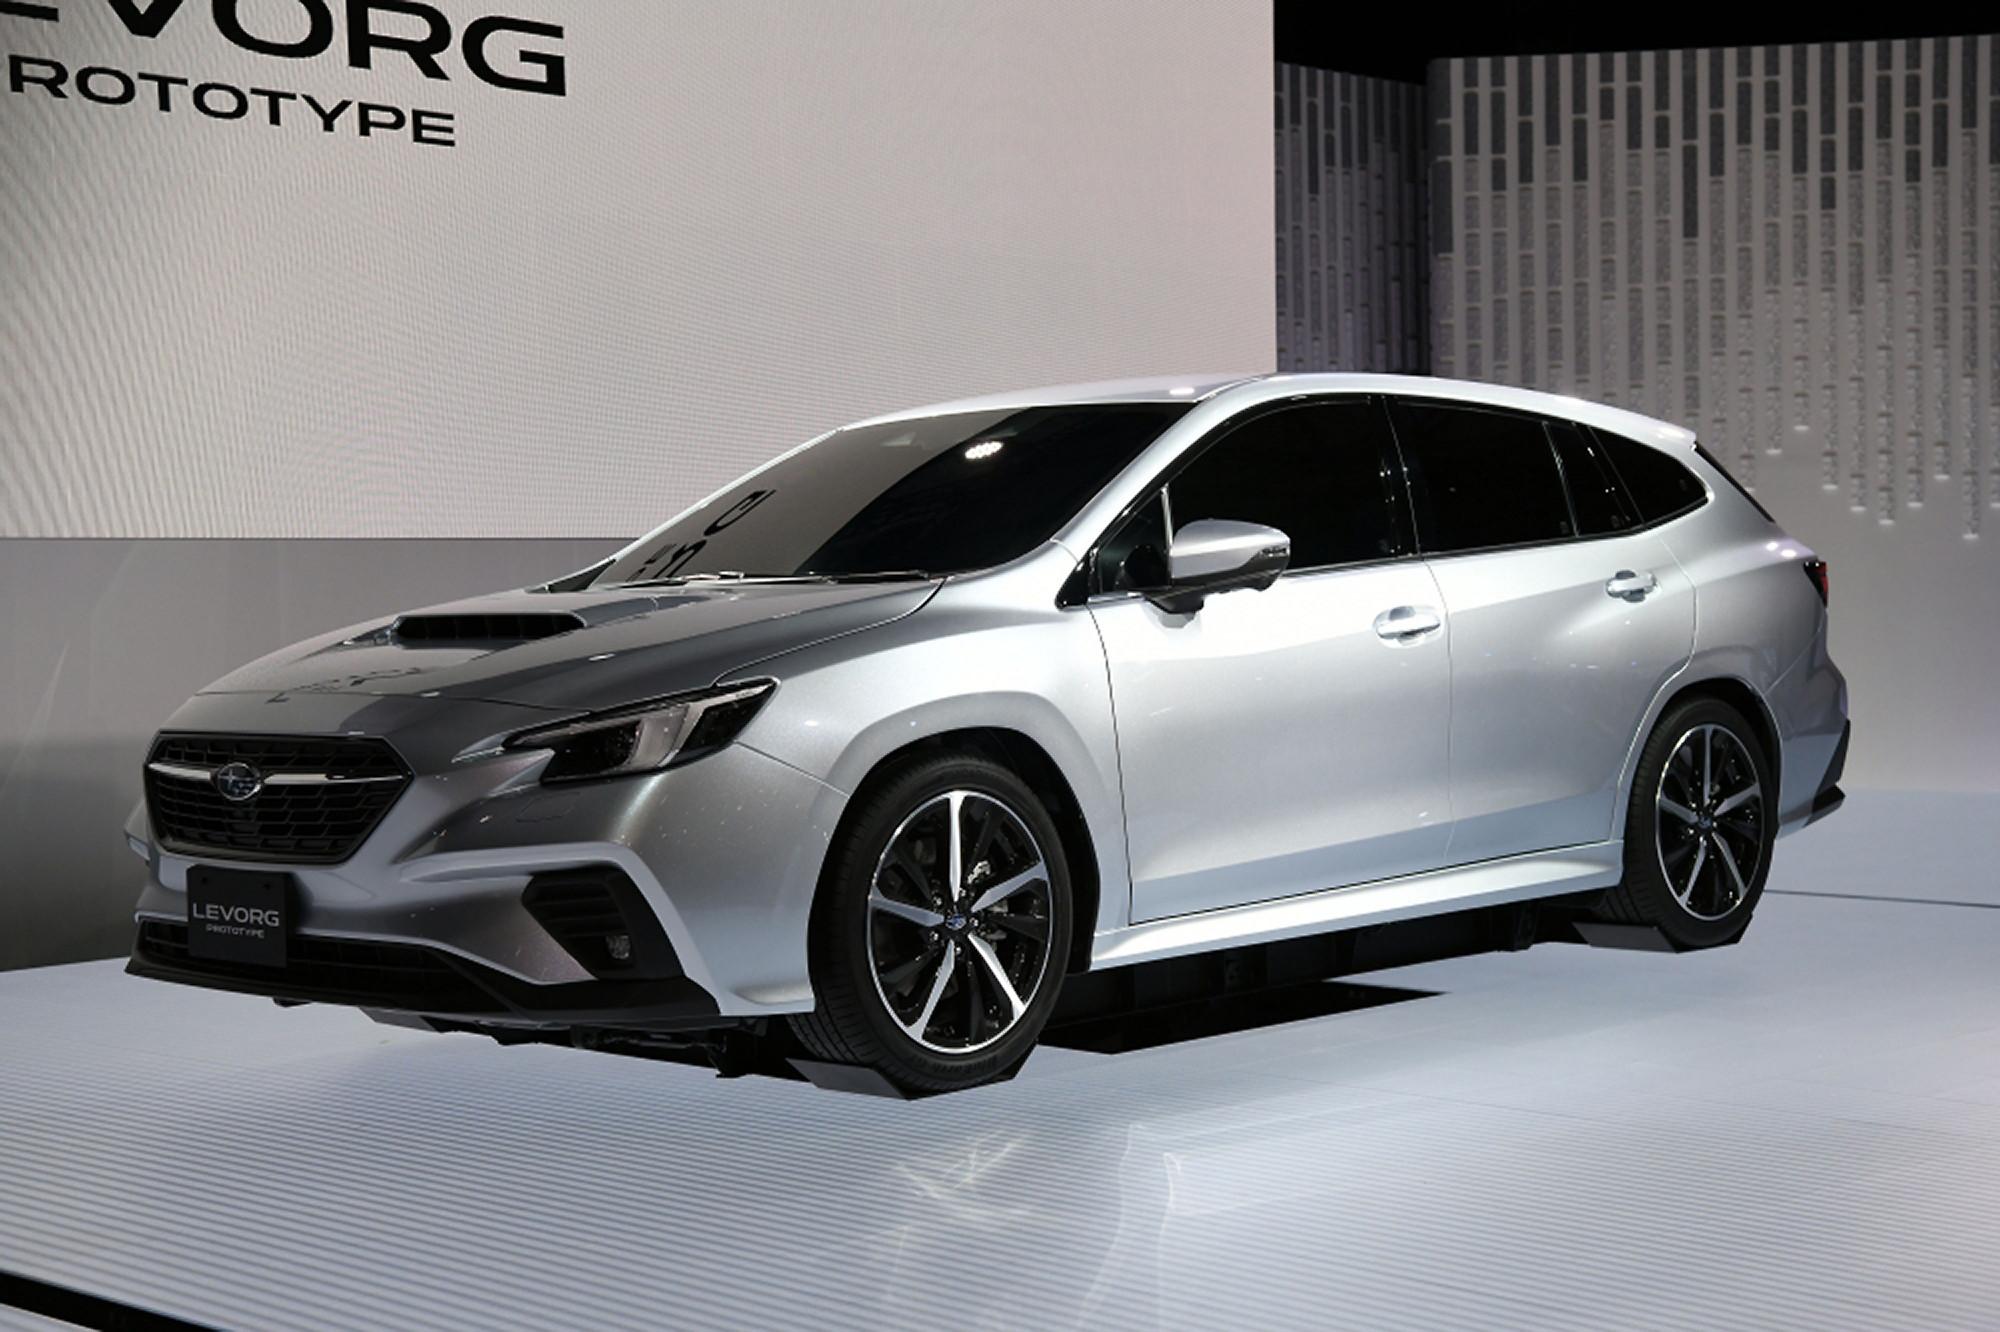 subaru-levorg-prototype-concept-2019-exterior-silver.jpg